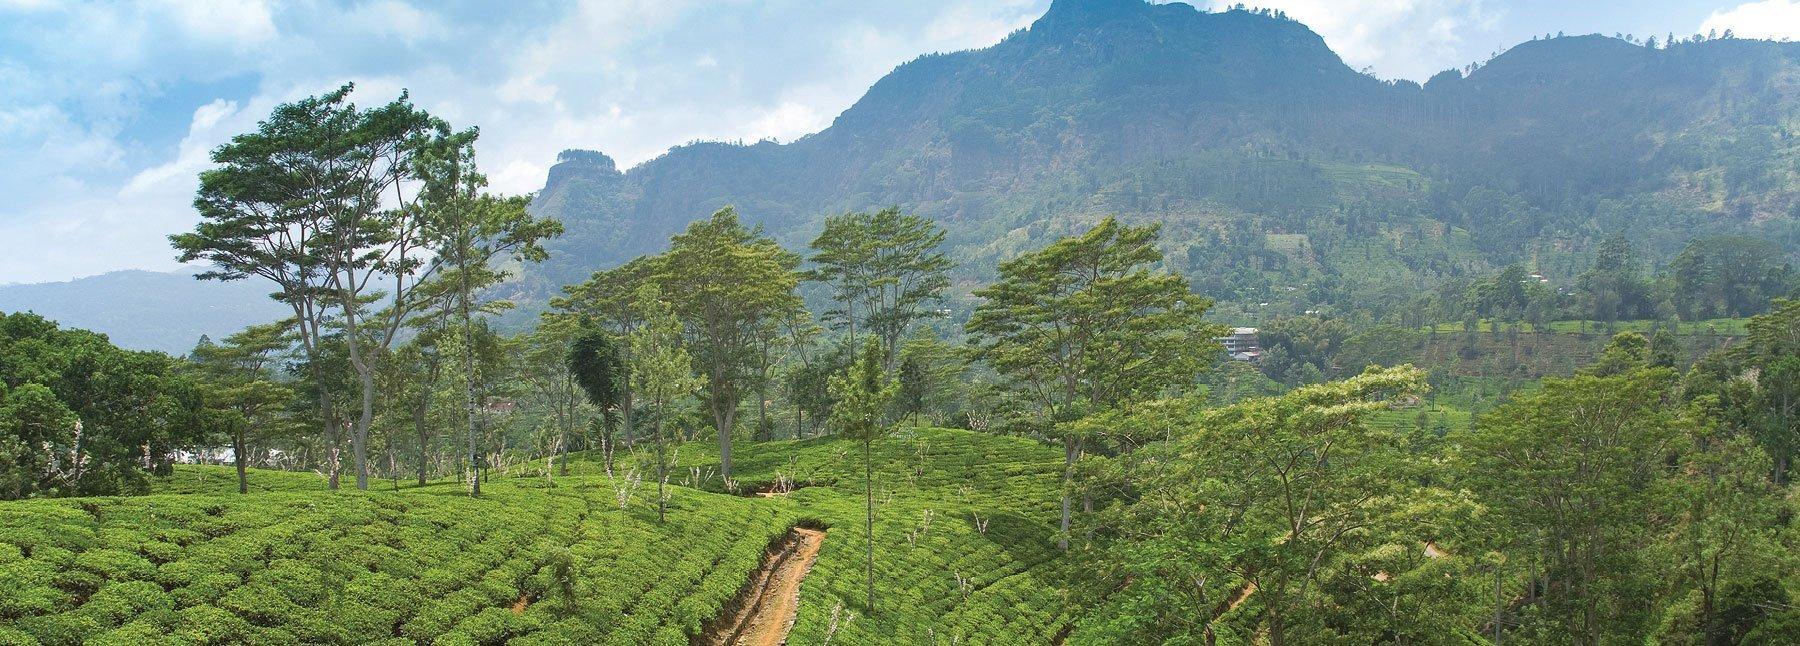 Sri Lanka Teeplantage Hochland